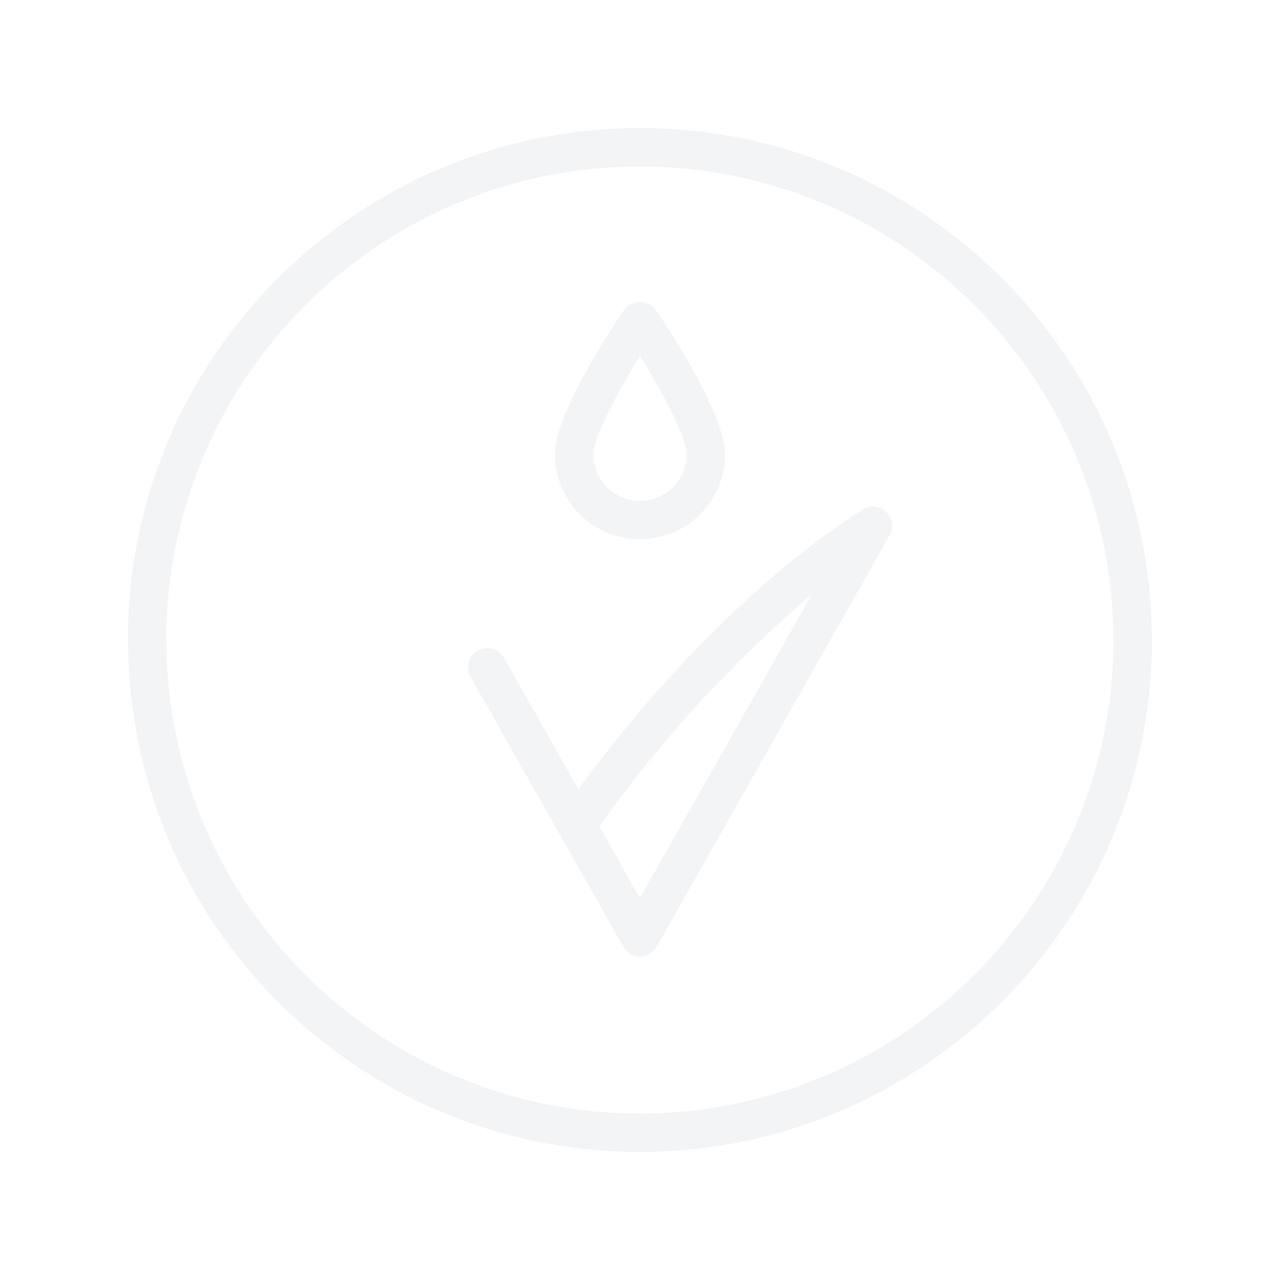 WELLA PROFESSIONALS Invigo Volume Bodifying Shampoo 250ml